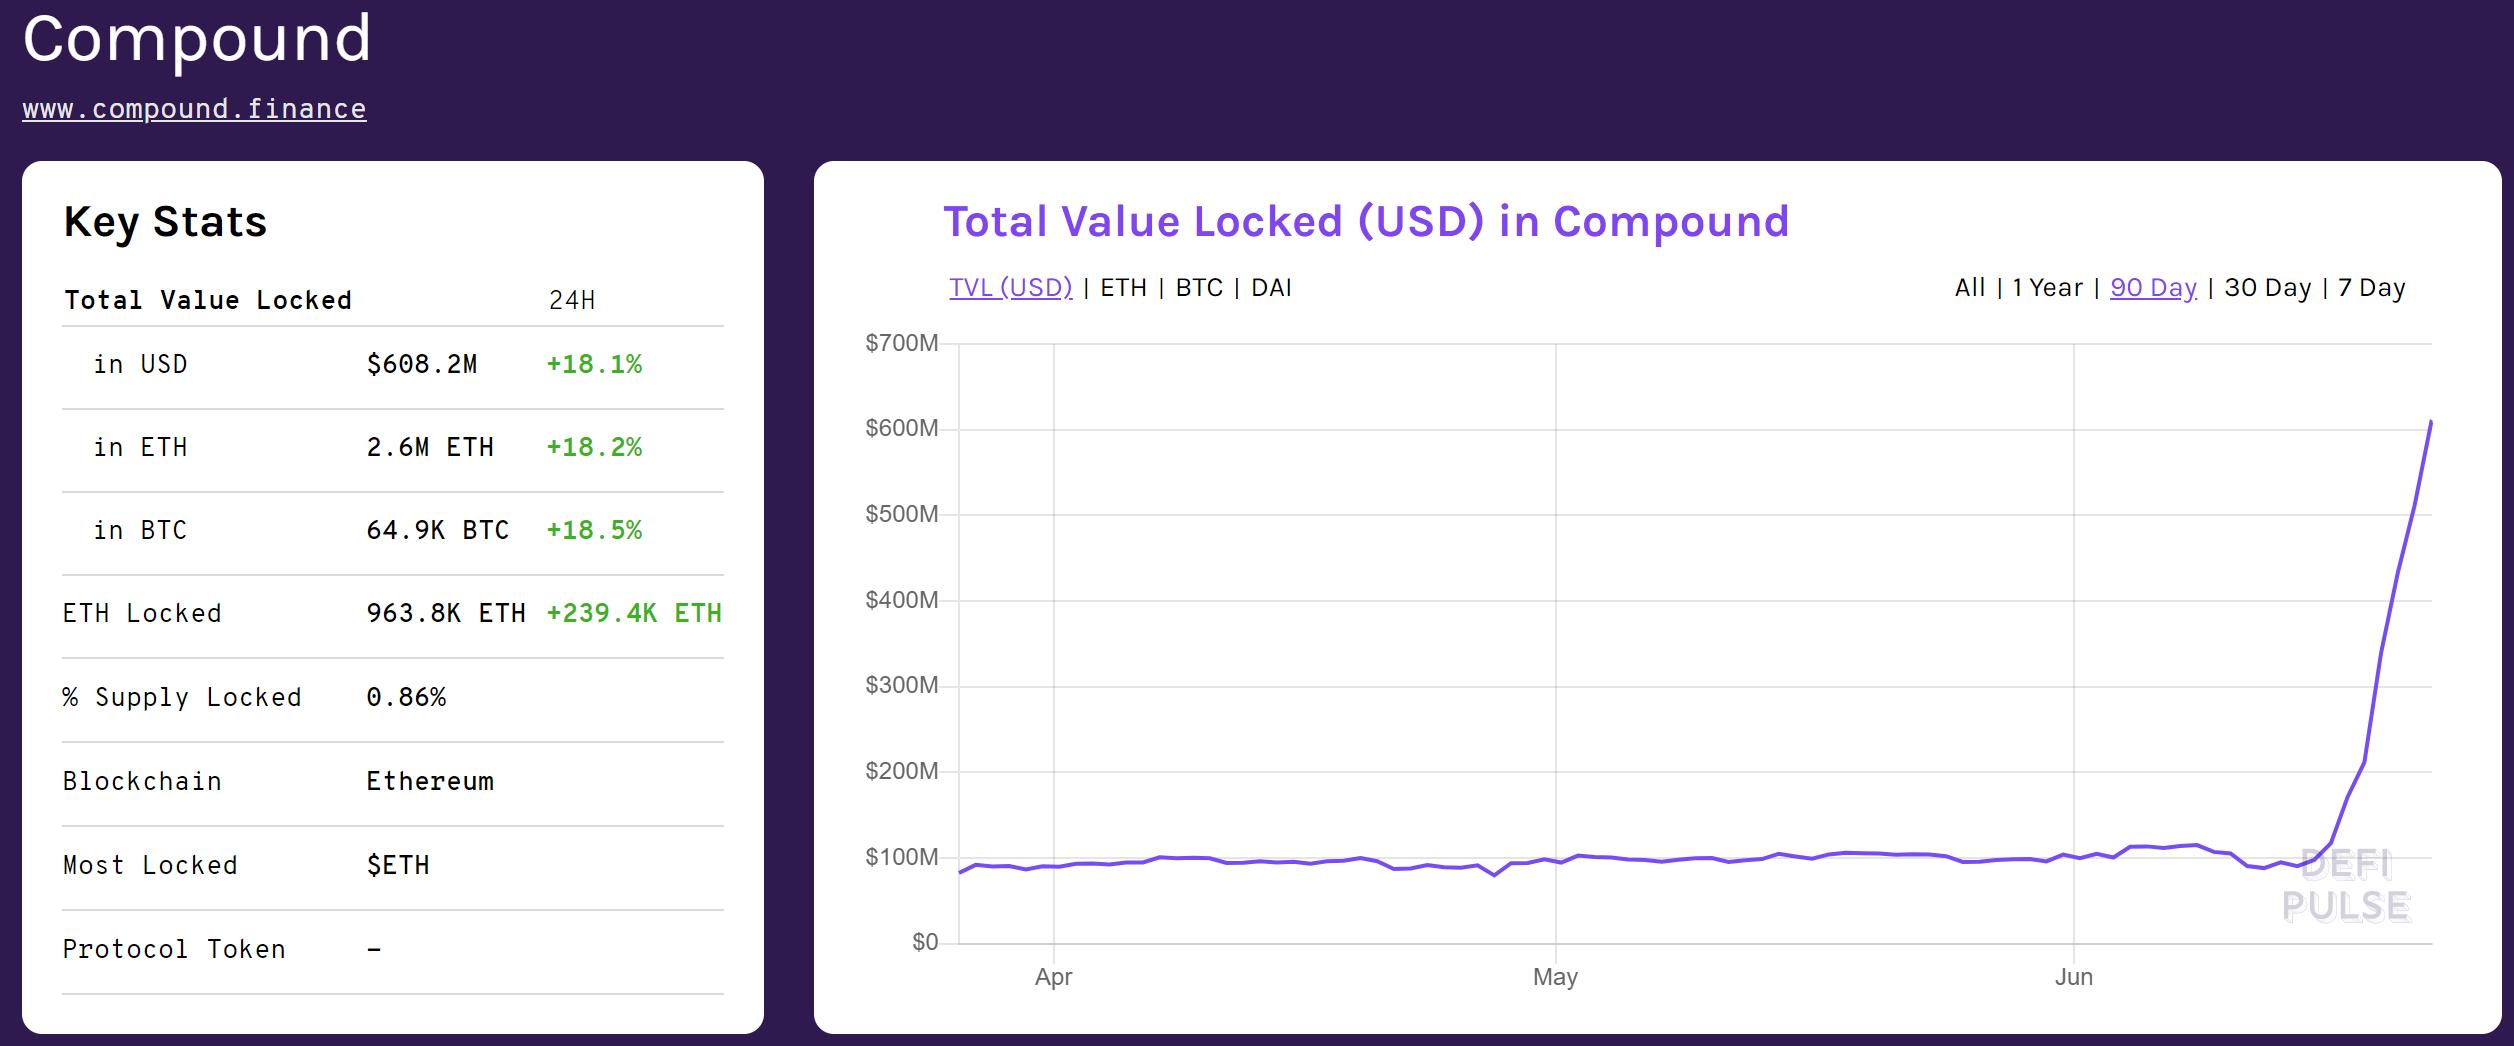 COMP价超ETH。为什么Coinbase迅速上线COMP?是不是想砸盘?是时候考虑做空COMP了。